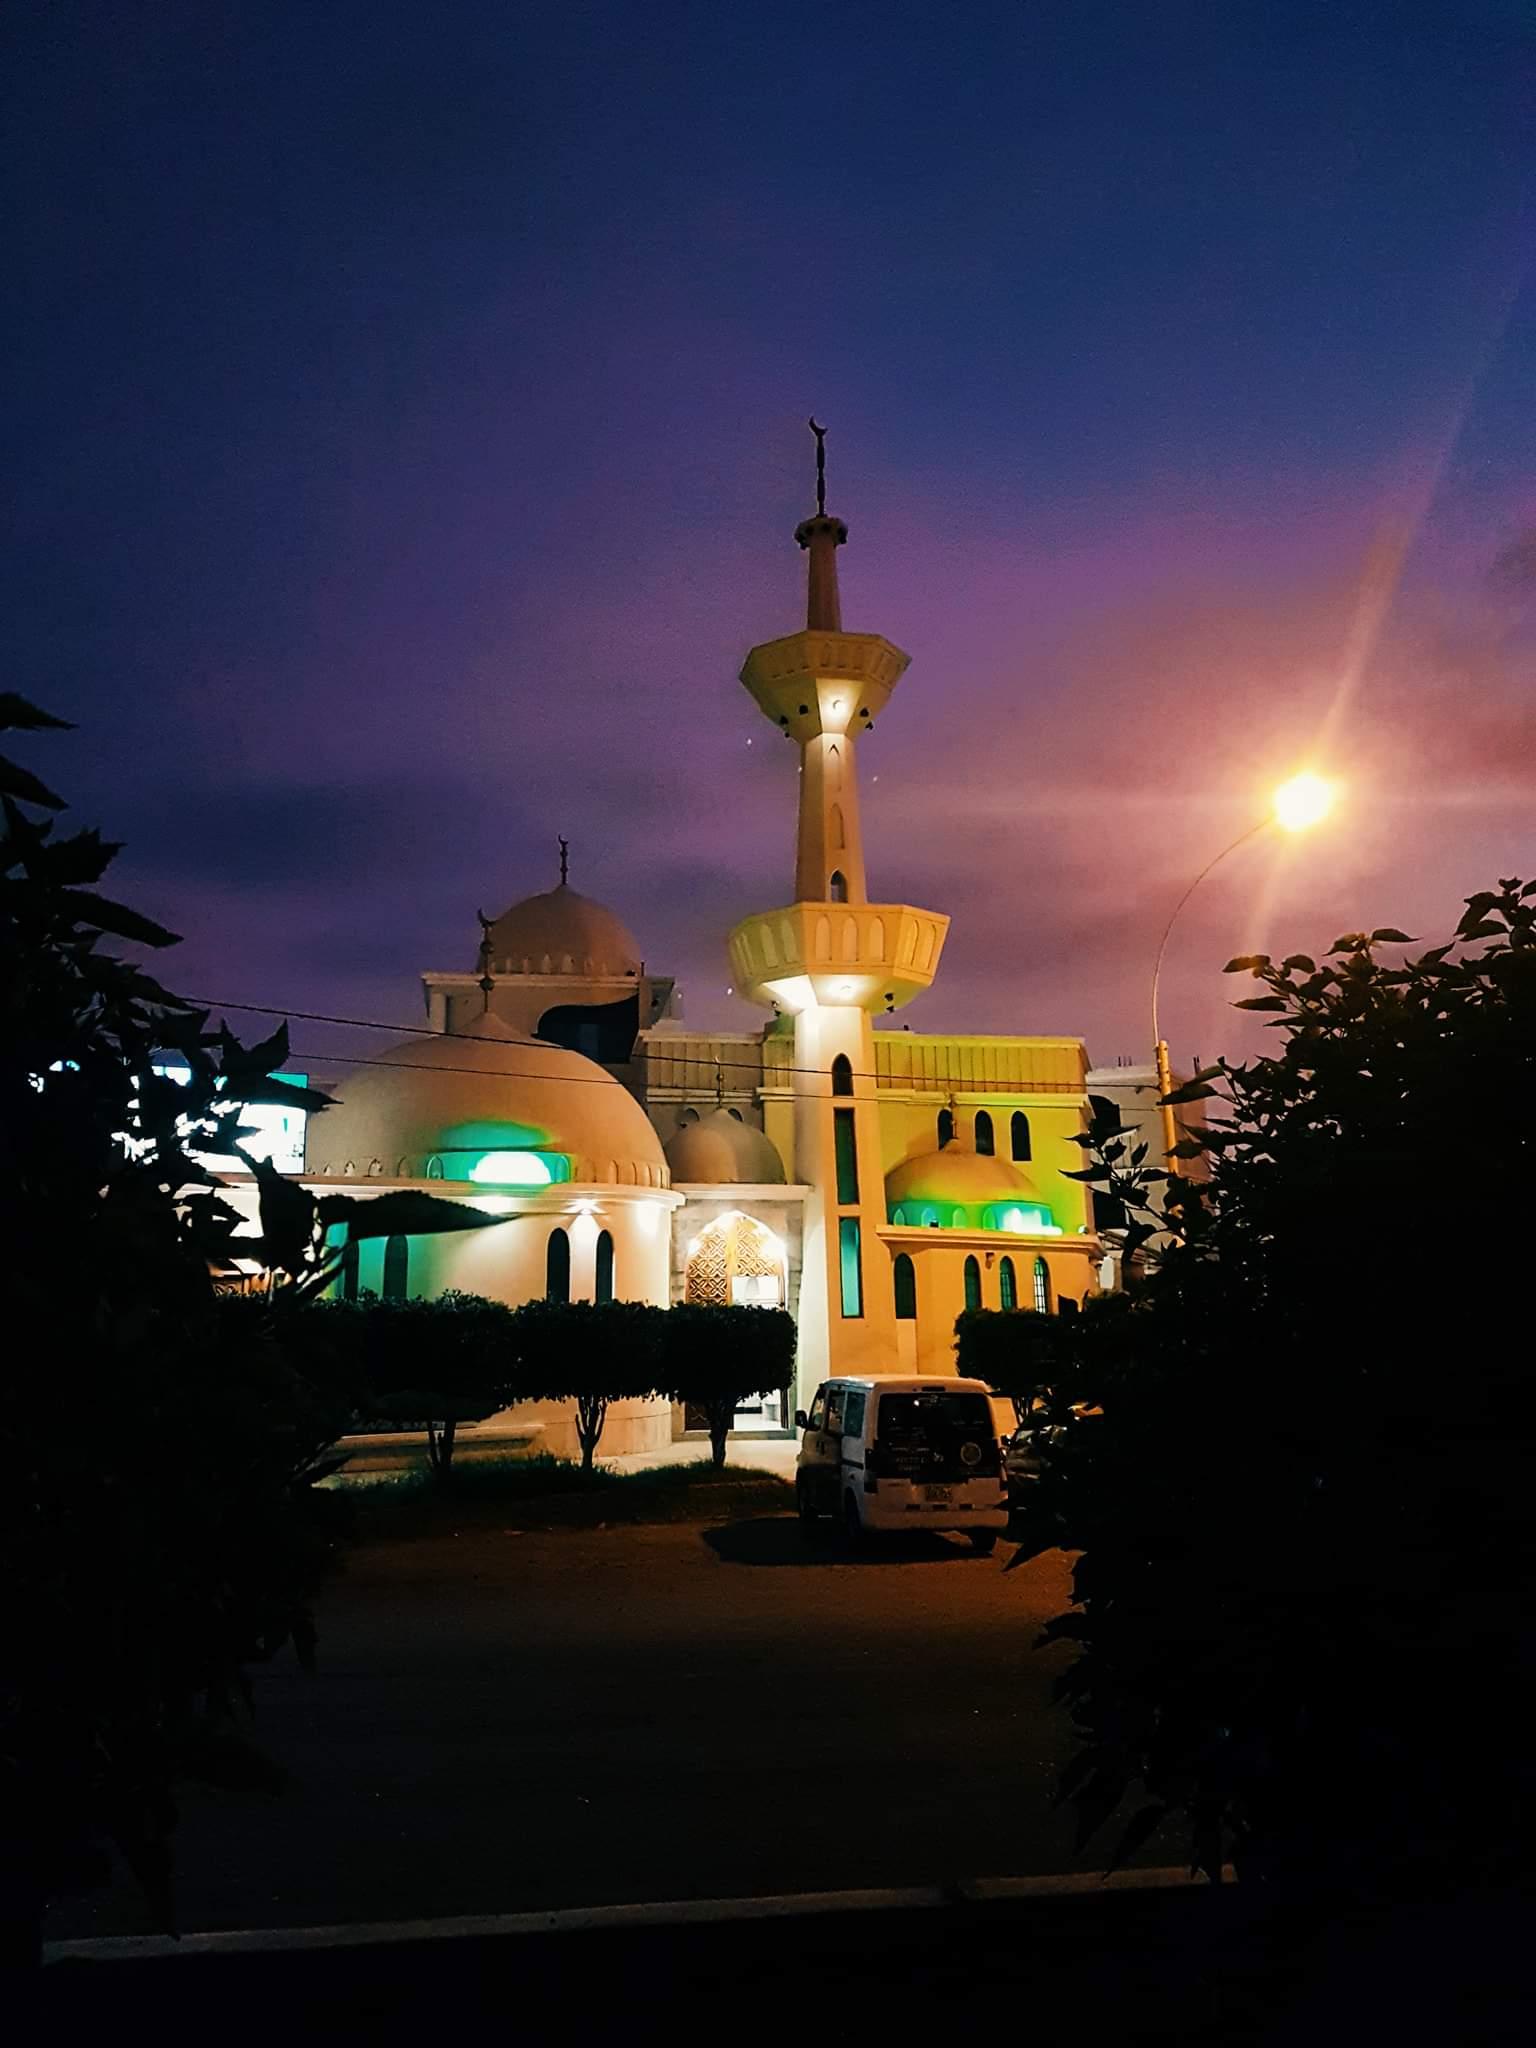 Файл:FB IMG 1553100222656 Mezquita Bab Ul Islam.jpg — Википедия